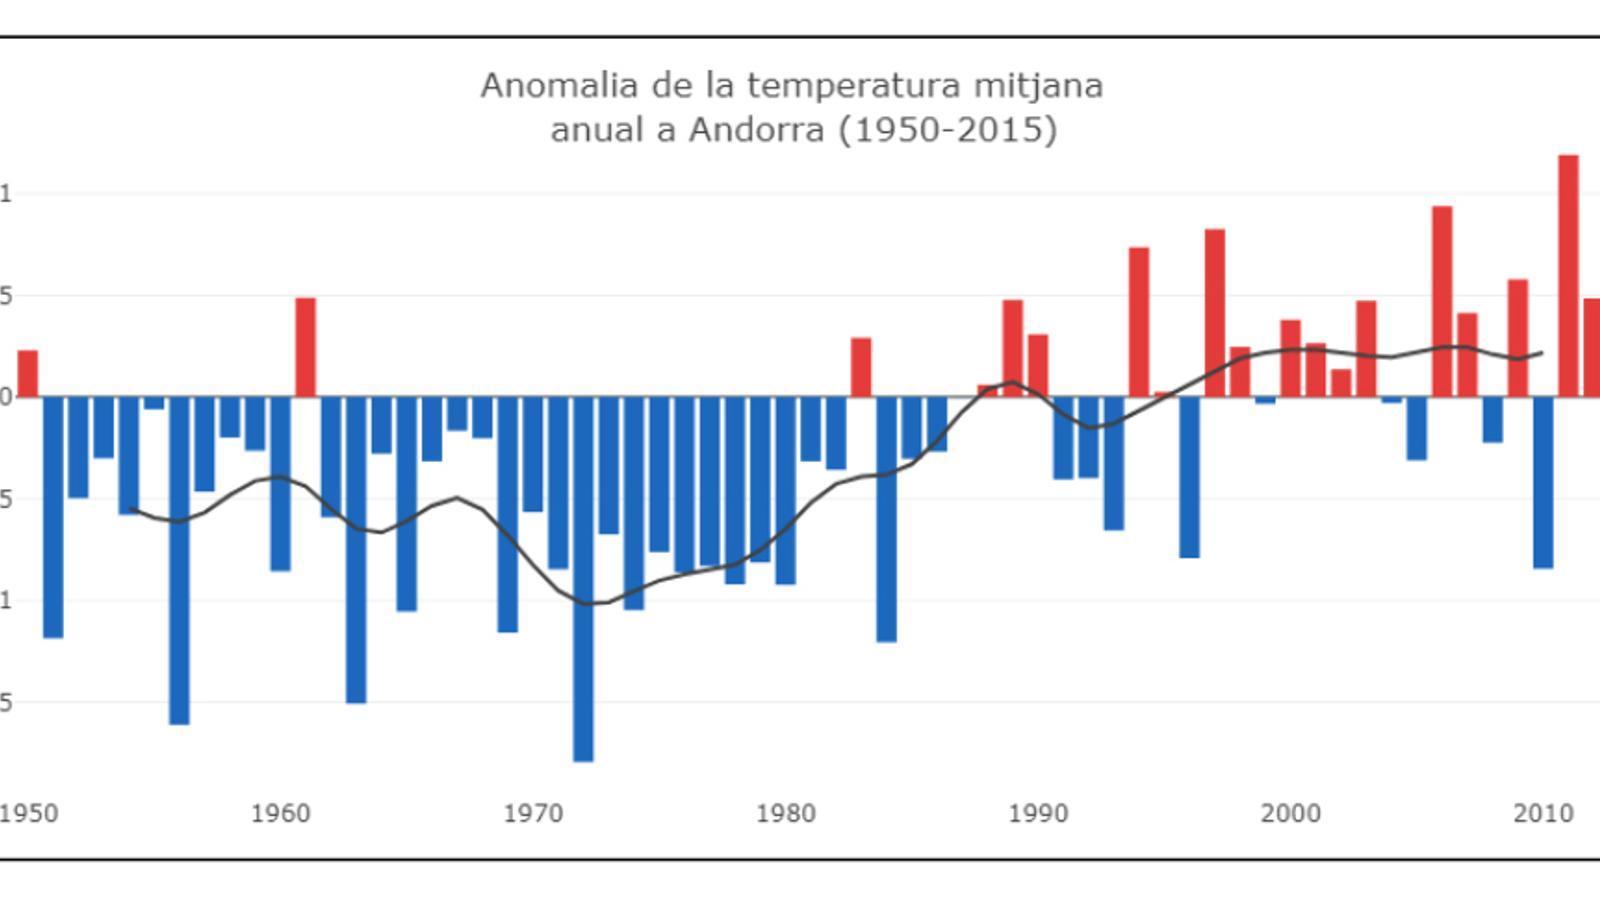 Anomalies de la temperatura mitjana a Andorra. / Cenma